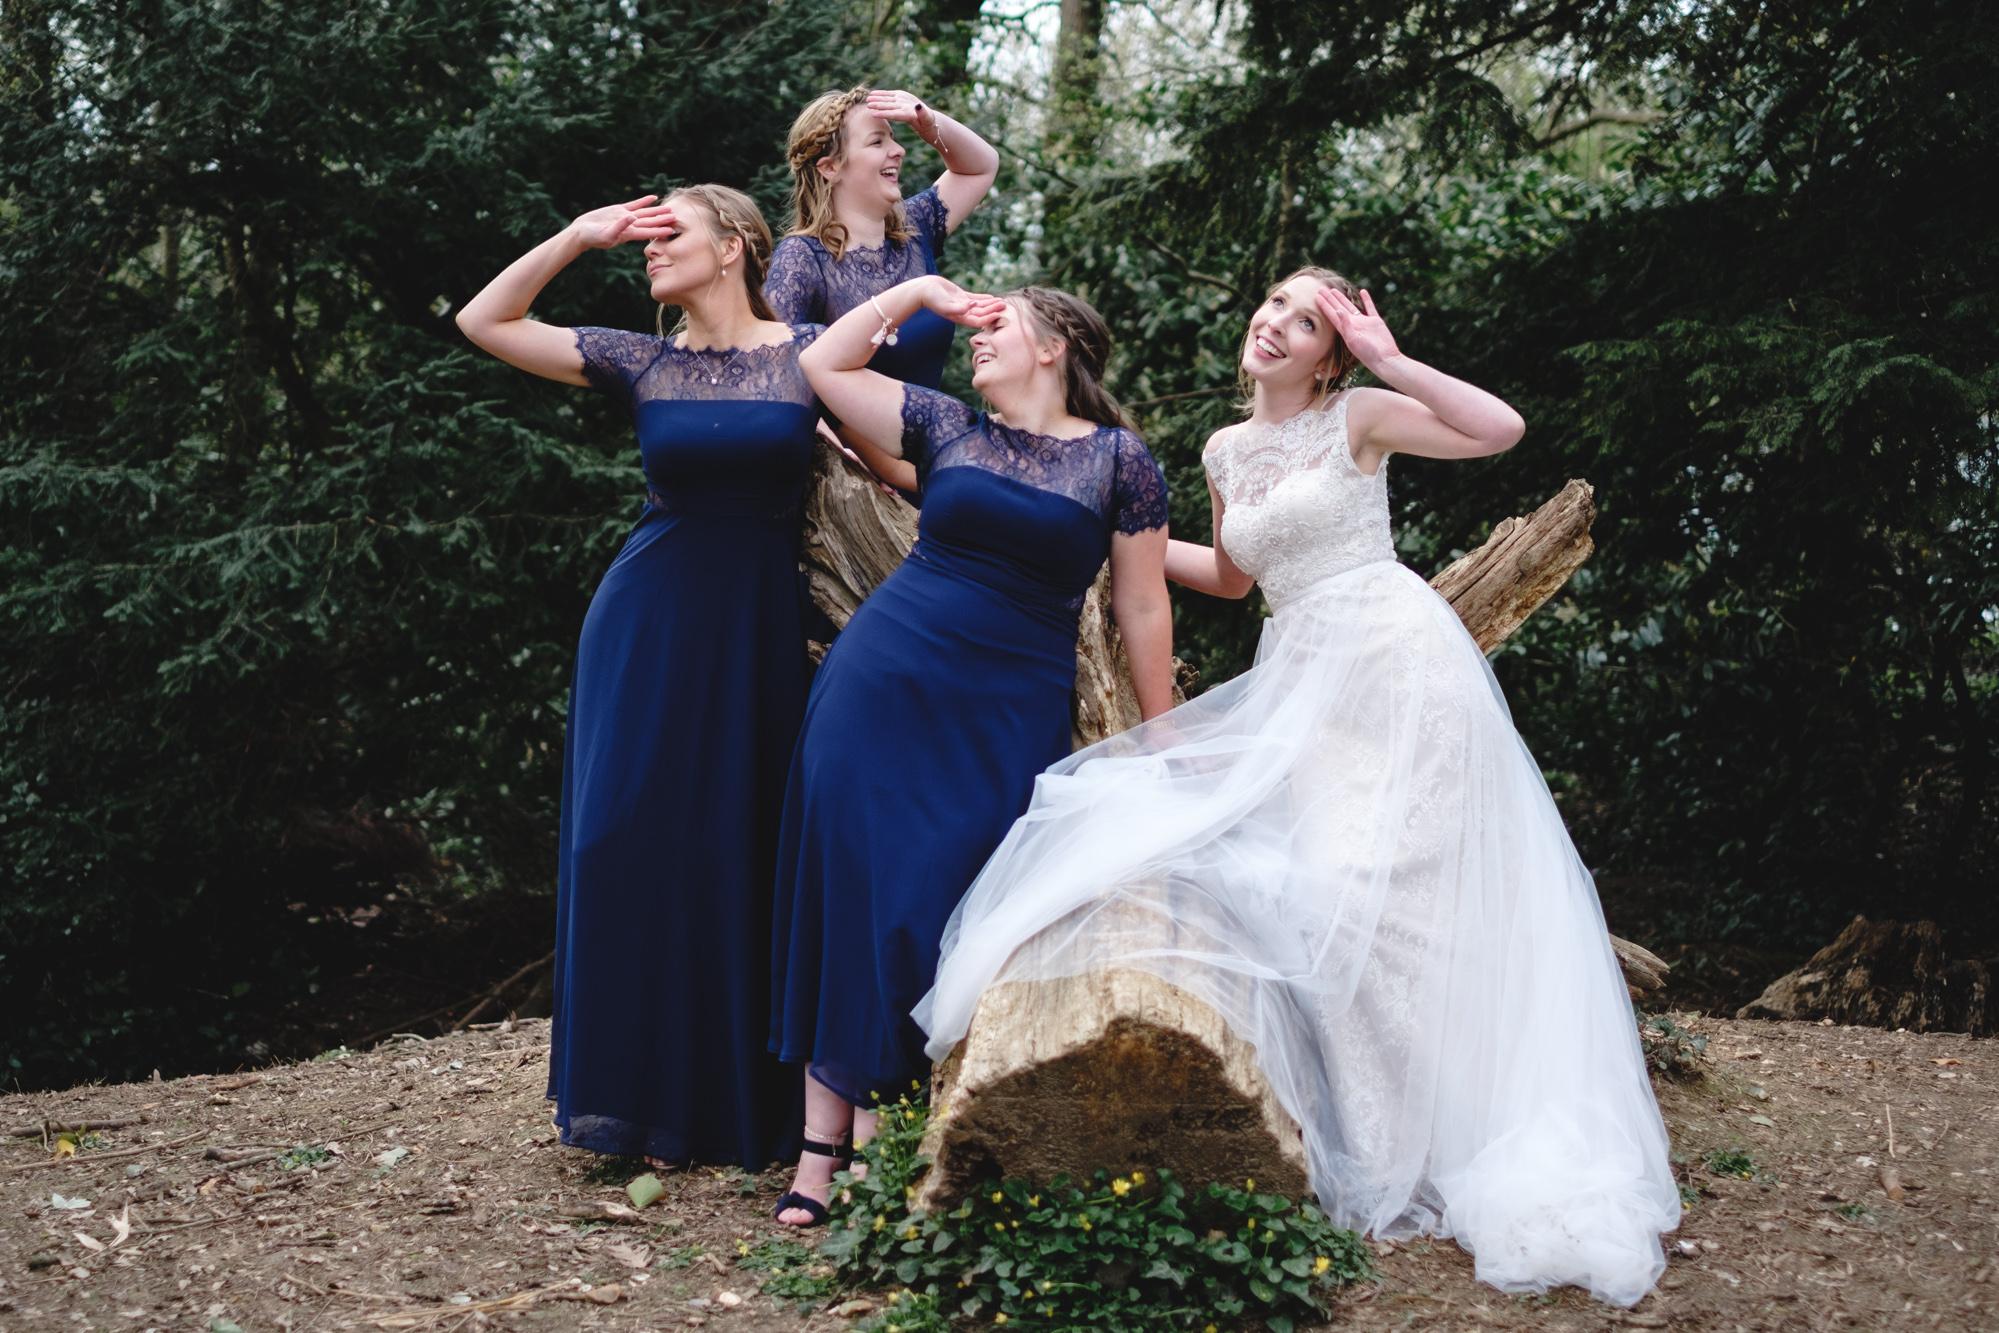 Katie and Dode weddings (125 of 207).jpg